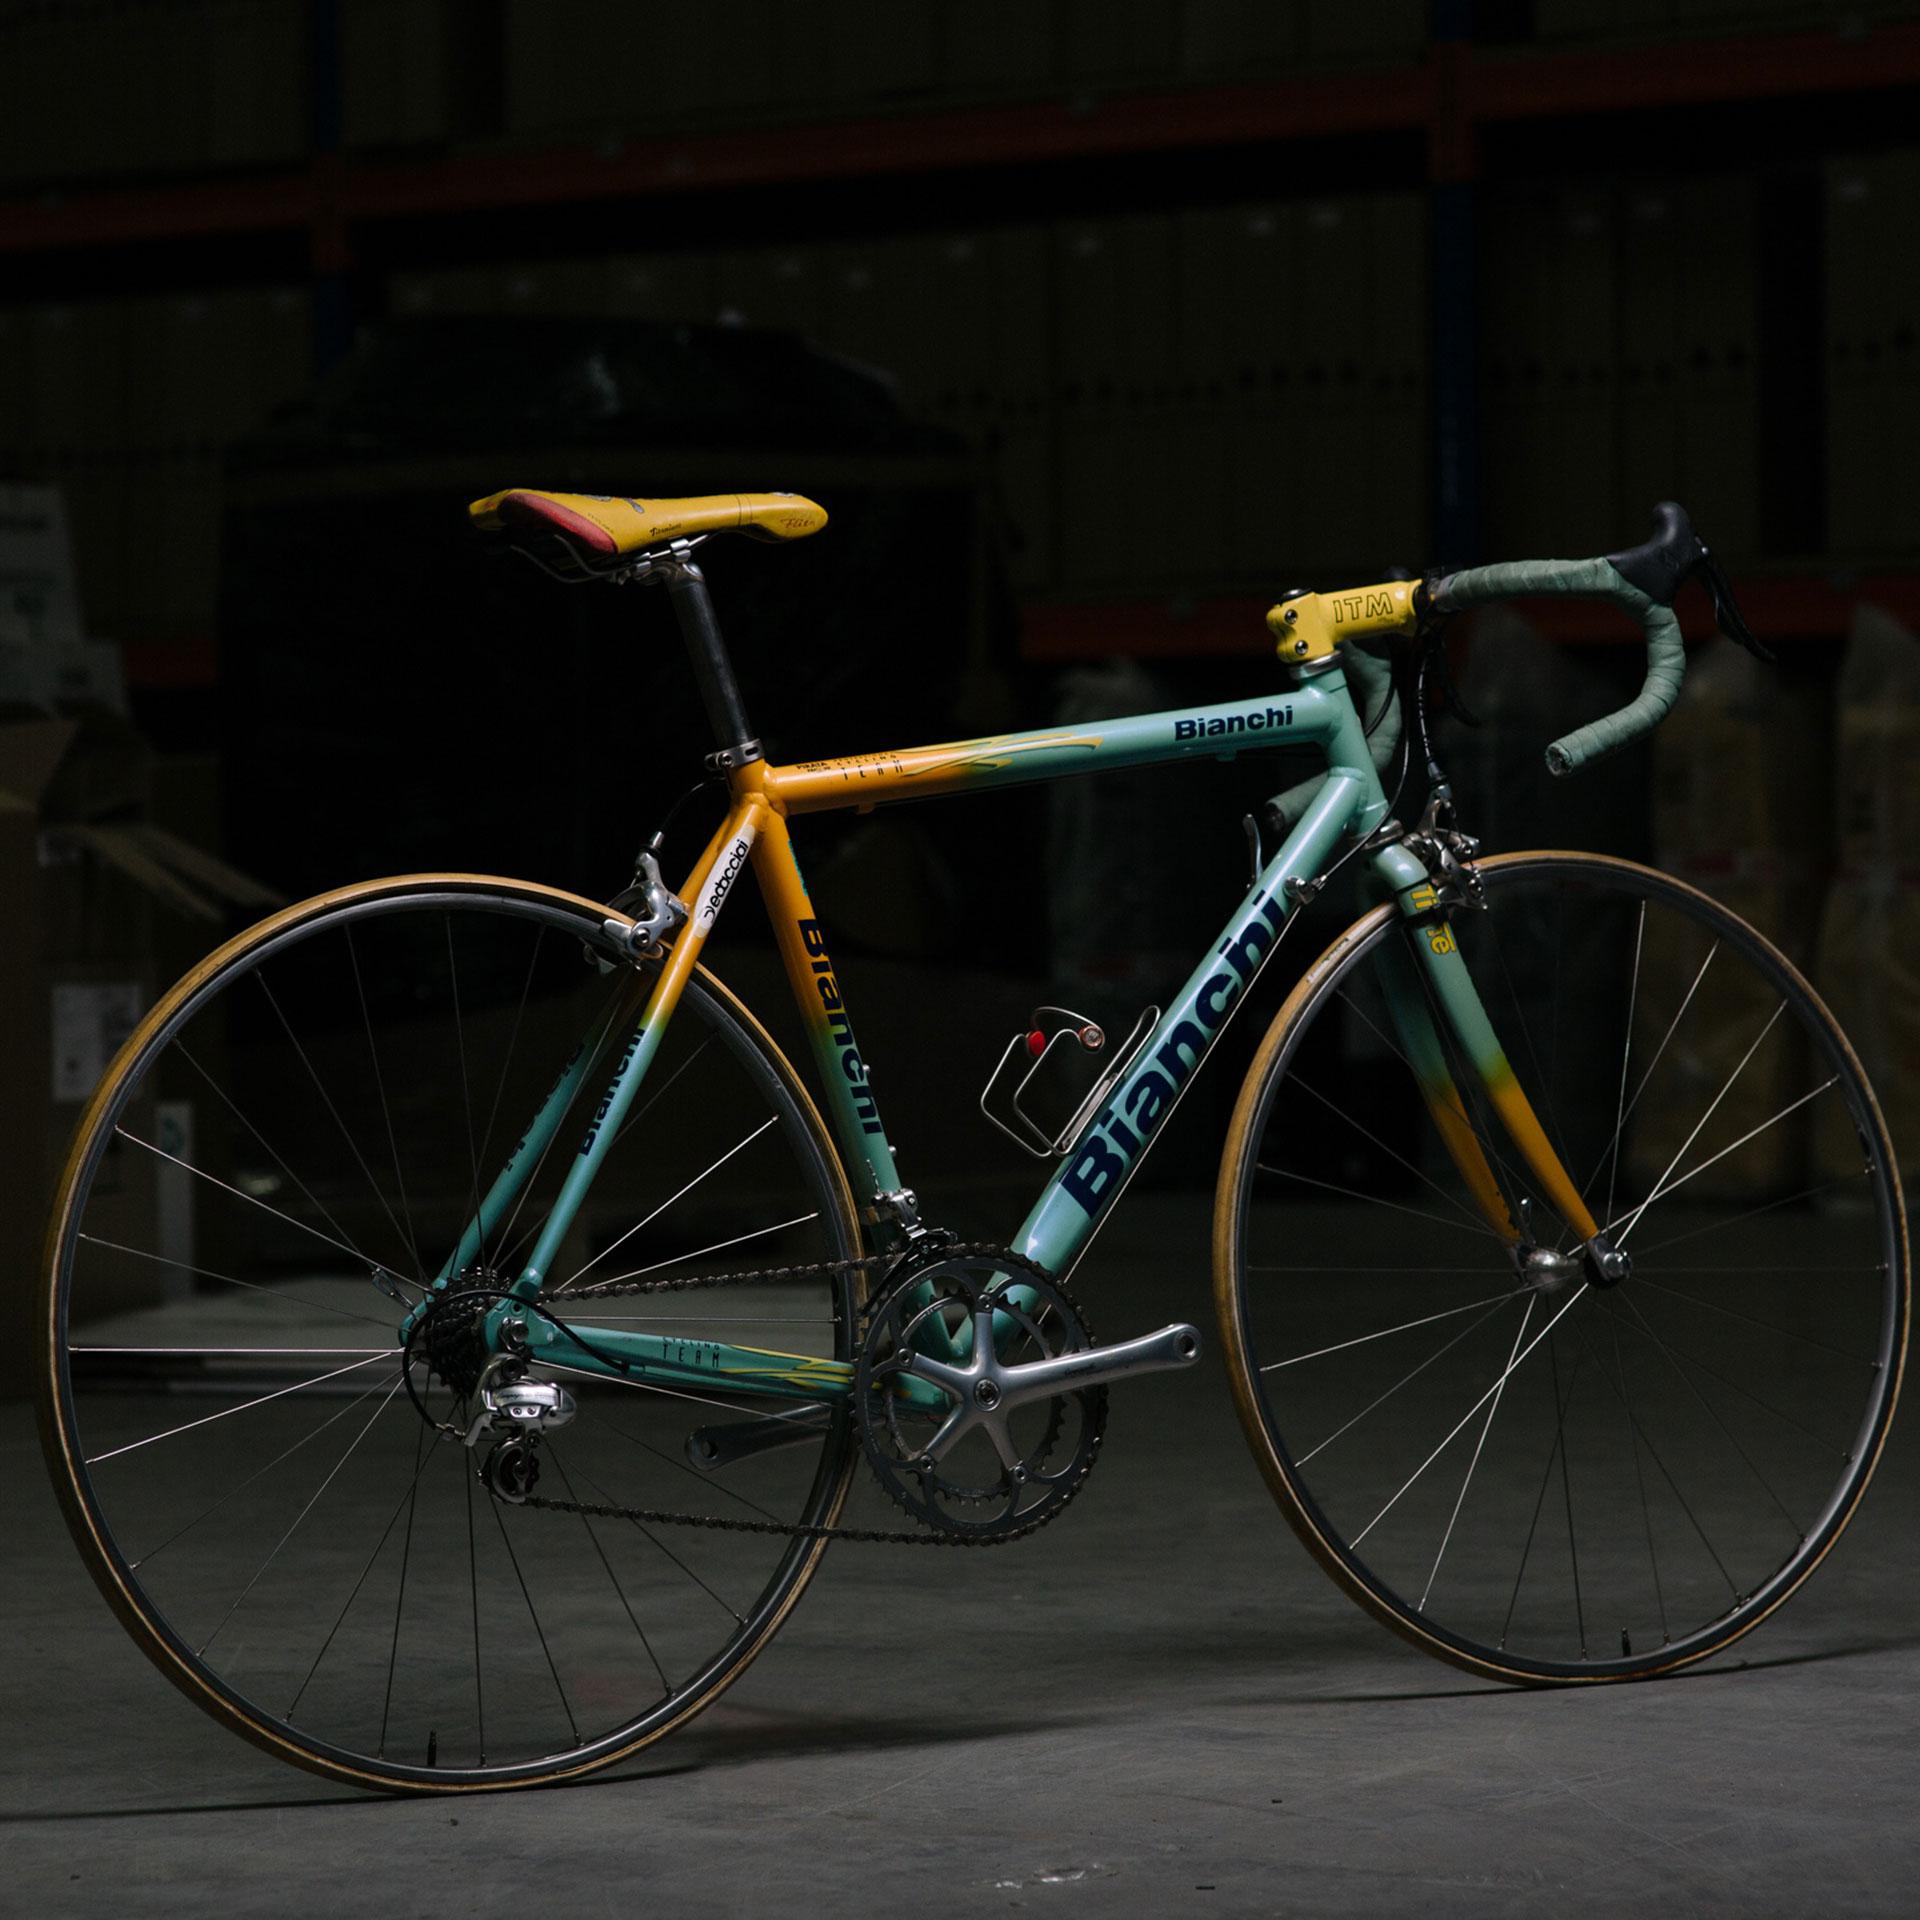 Marco Pantani's Bianchi